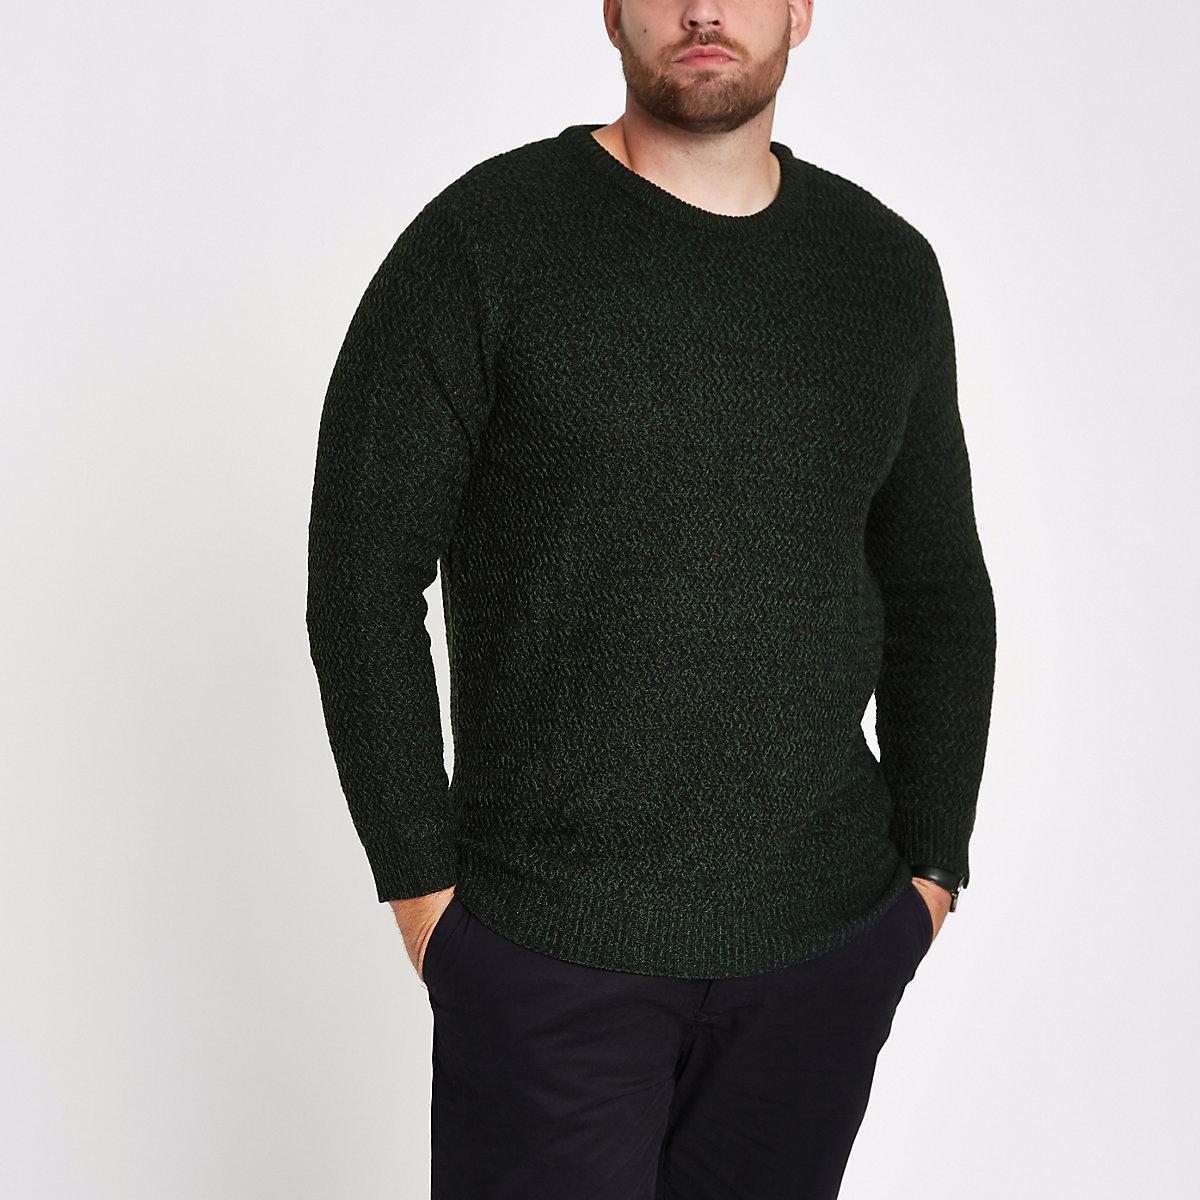 Big & Tall – Grüner, strukturierter Slim Fit Pullover